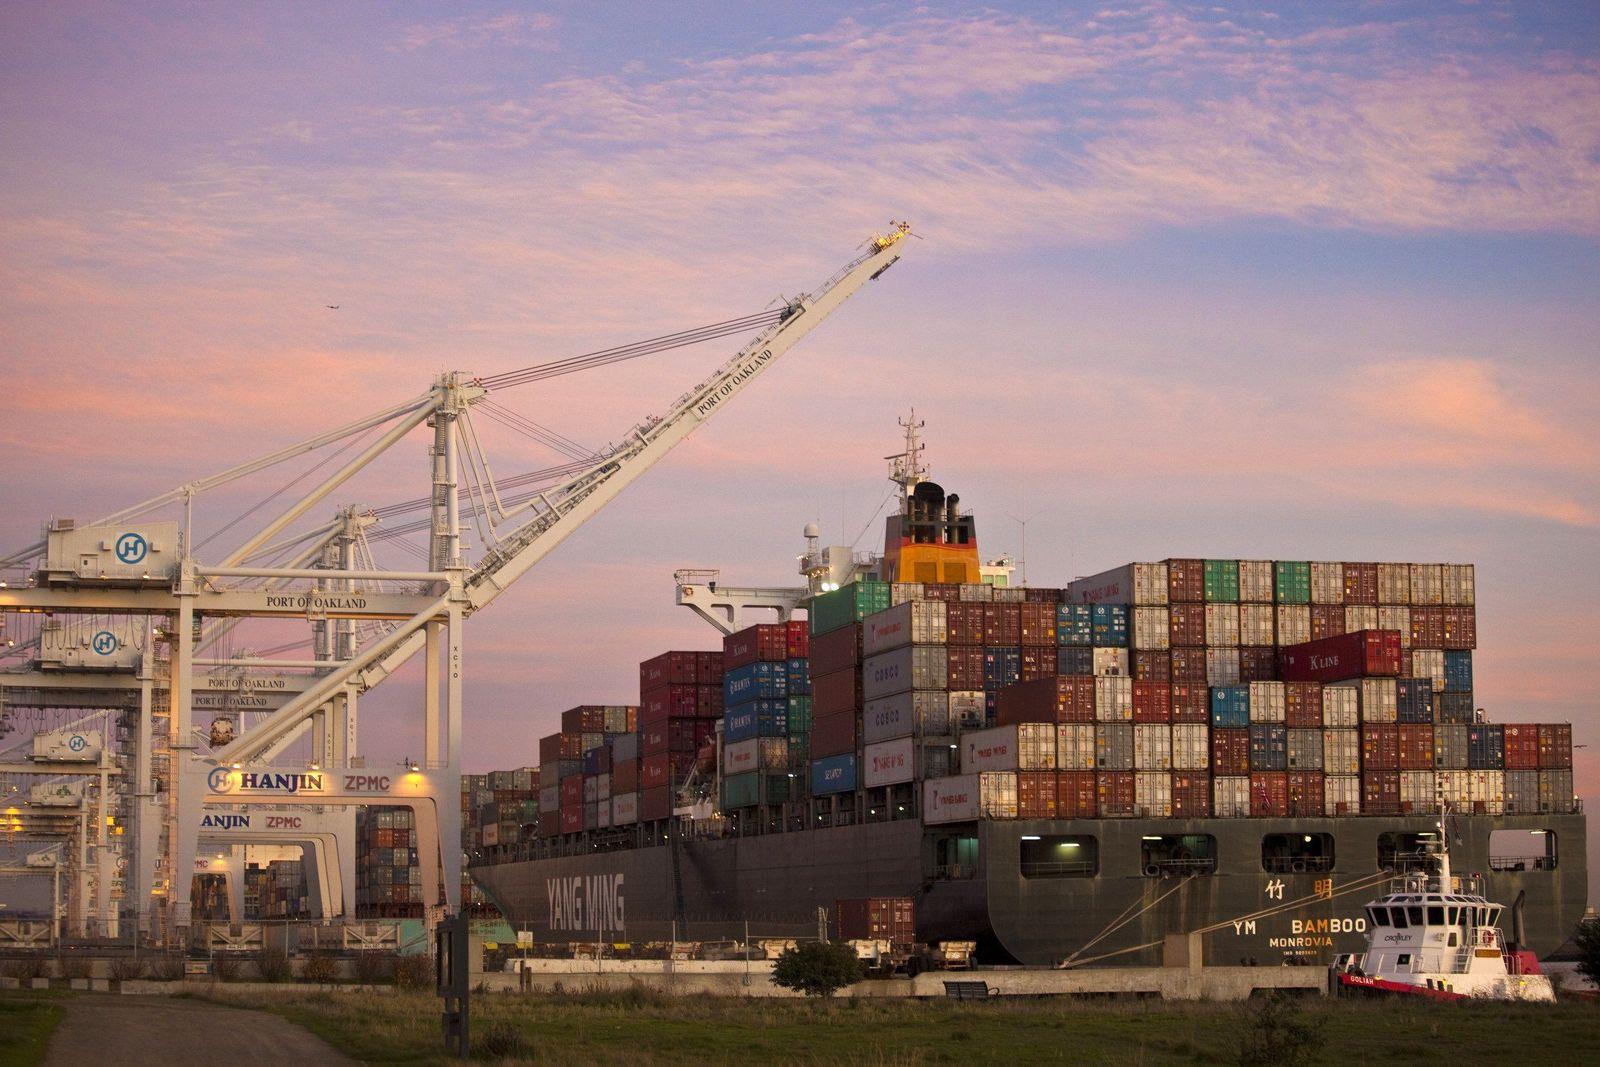 THEMA mmO: Außenhandel / Oakland (USA) / Containerschiff / Export / Handel